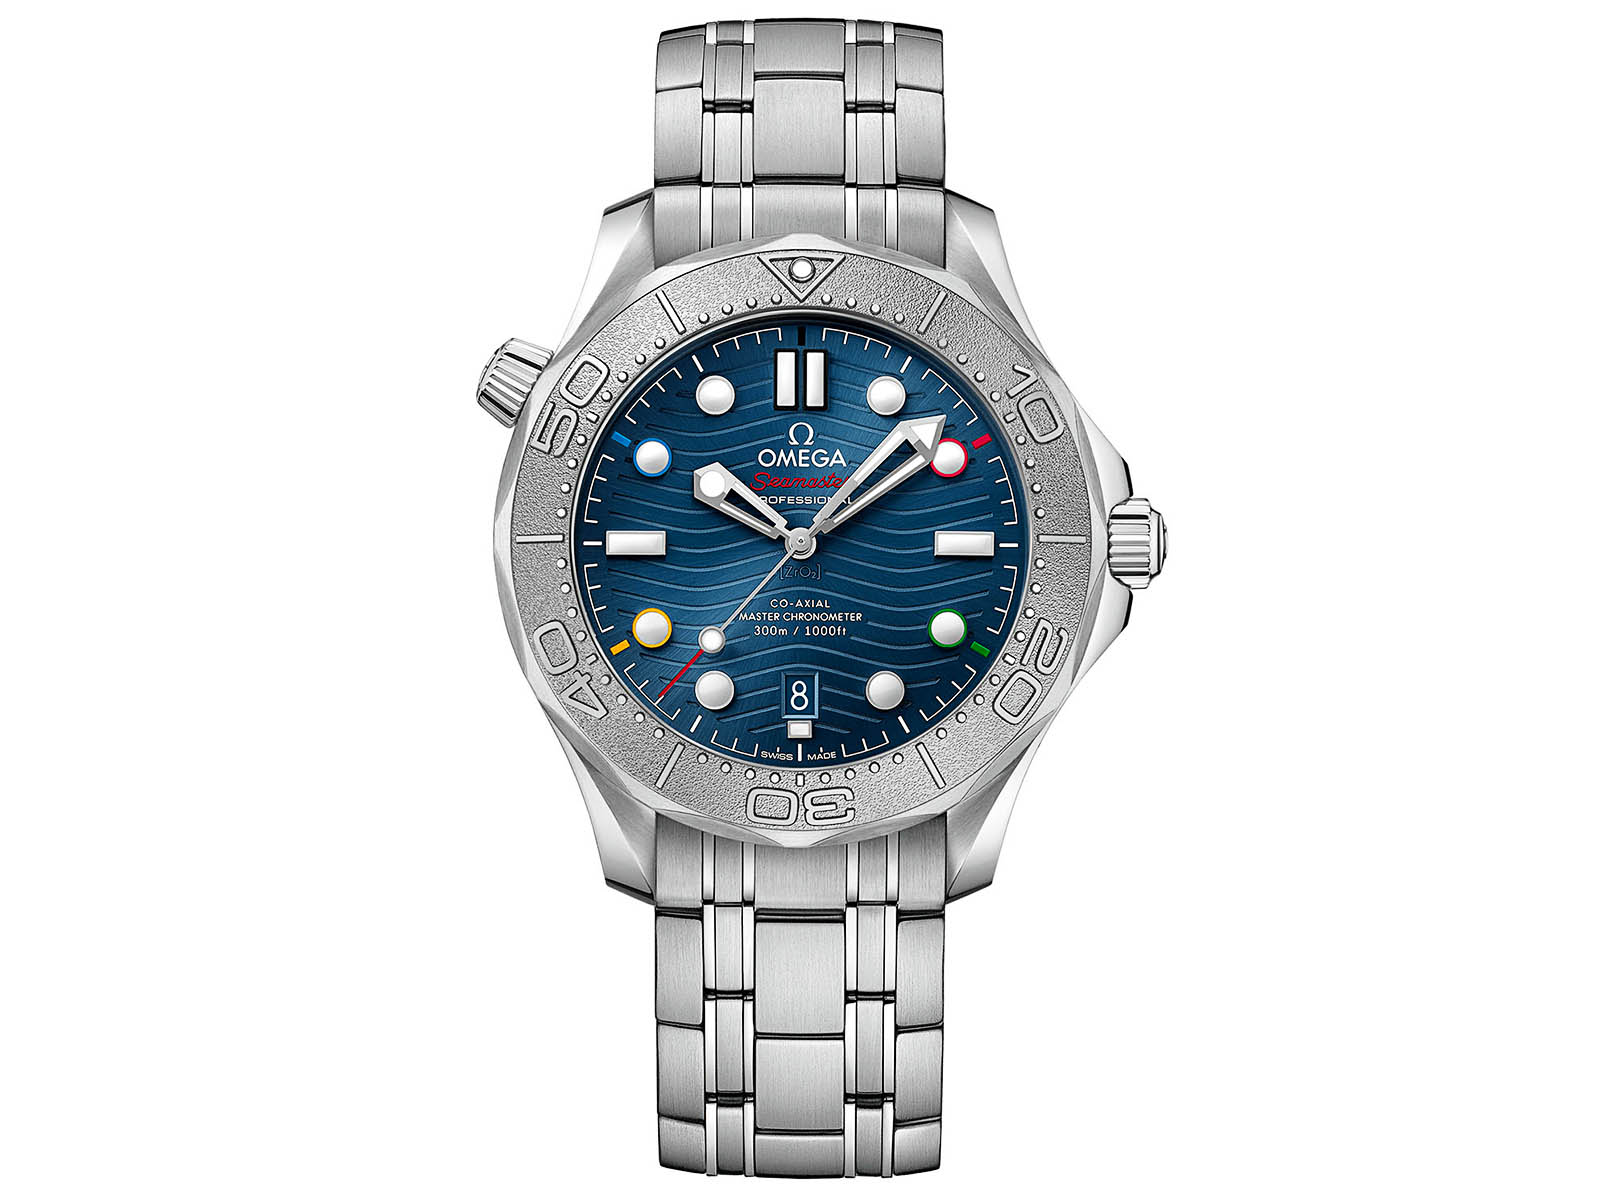 522-30-42-20-03-001-omega-seamaster-diver-300m-beijing-2022-special-edition-8.jpg